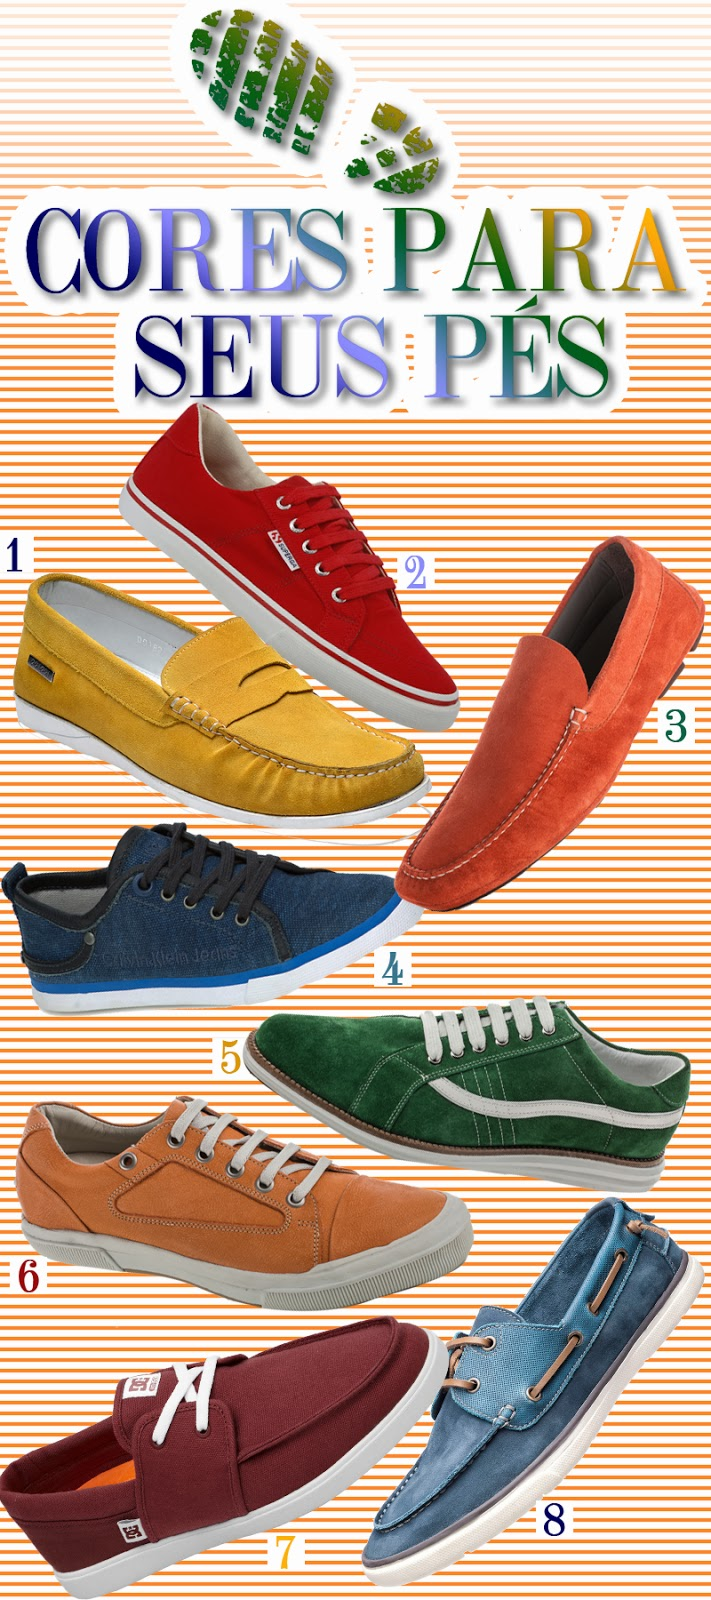 Sapatênis azul Calvin Klein (R  260) 5. Sapatênis verde CNS (R  320) 6.  Sapatênis laranja CNS (R  250) 7. Tênis DC Shoes (R  250) fe196ab904